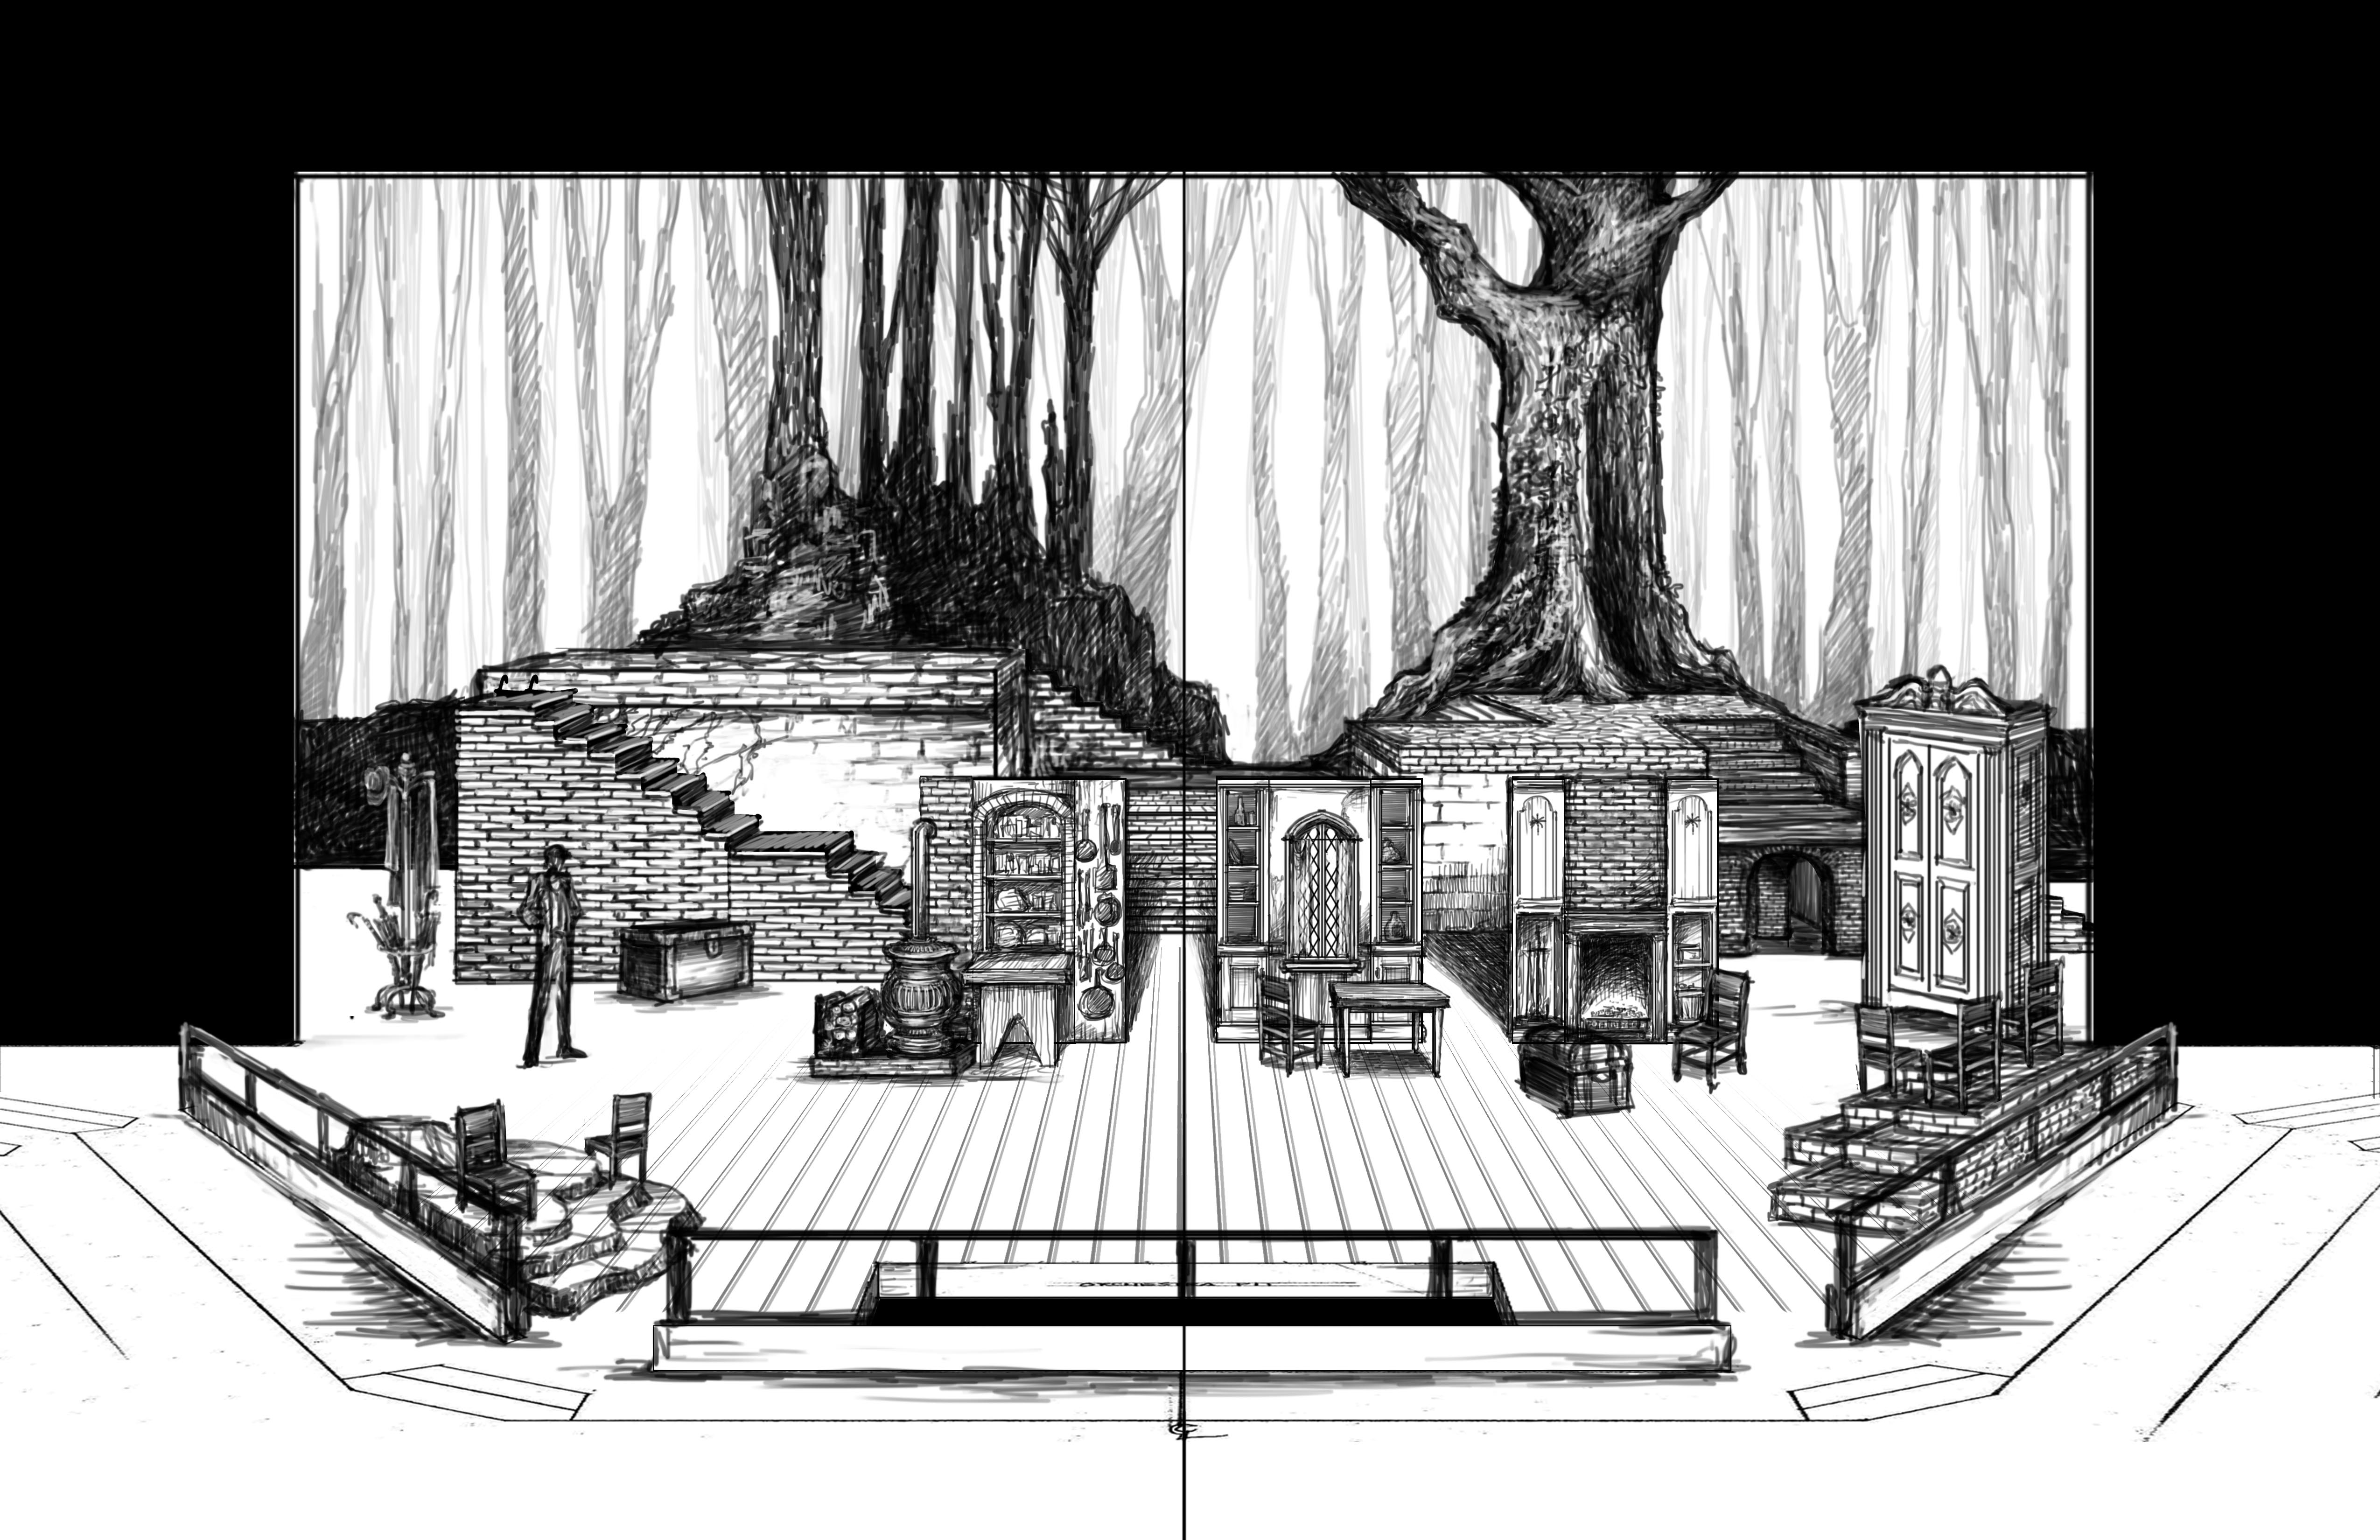 3. Threee Houses